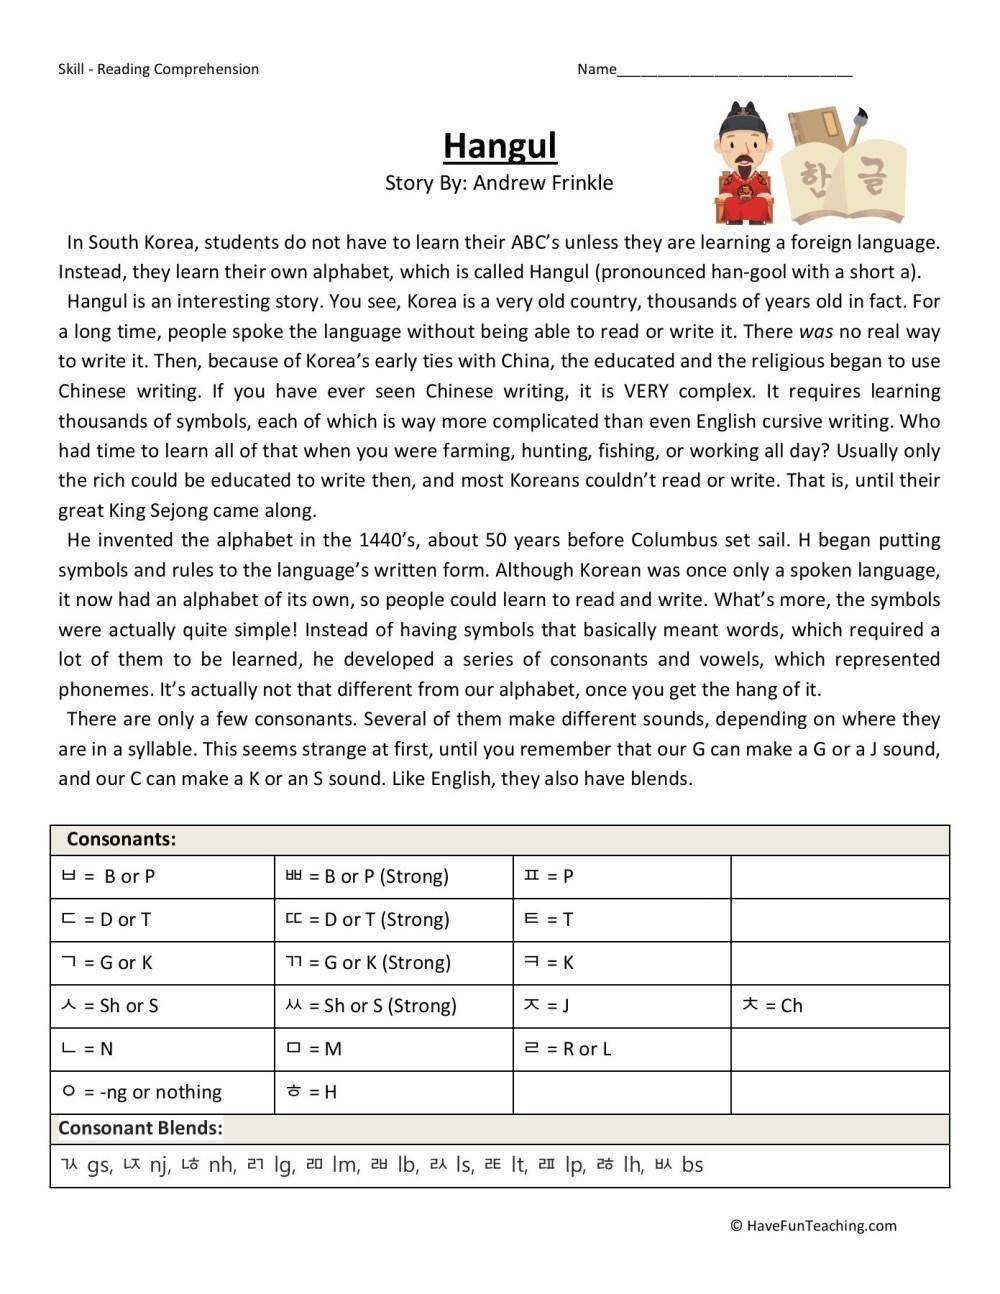 medium resolution of hangul-sixth-grade-reading-comprehension-worksheet Pages 1 - 5 - Flip PDF  Download   FlipHTML5